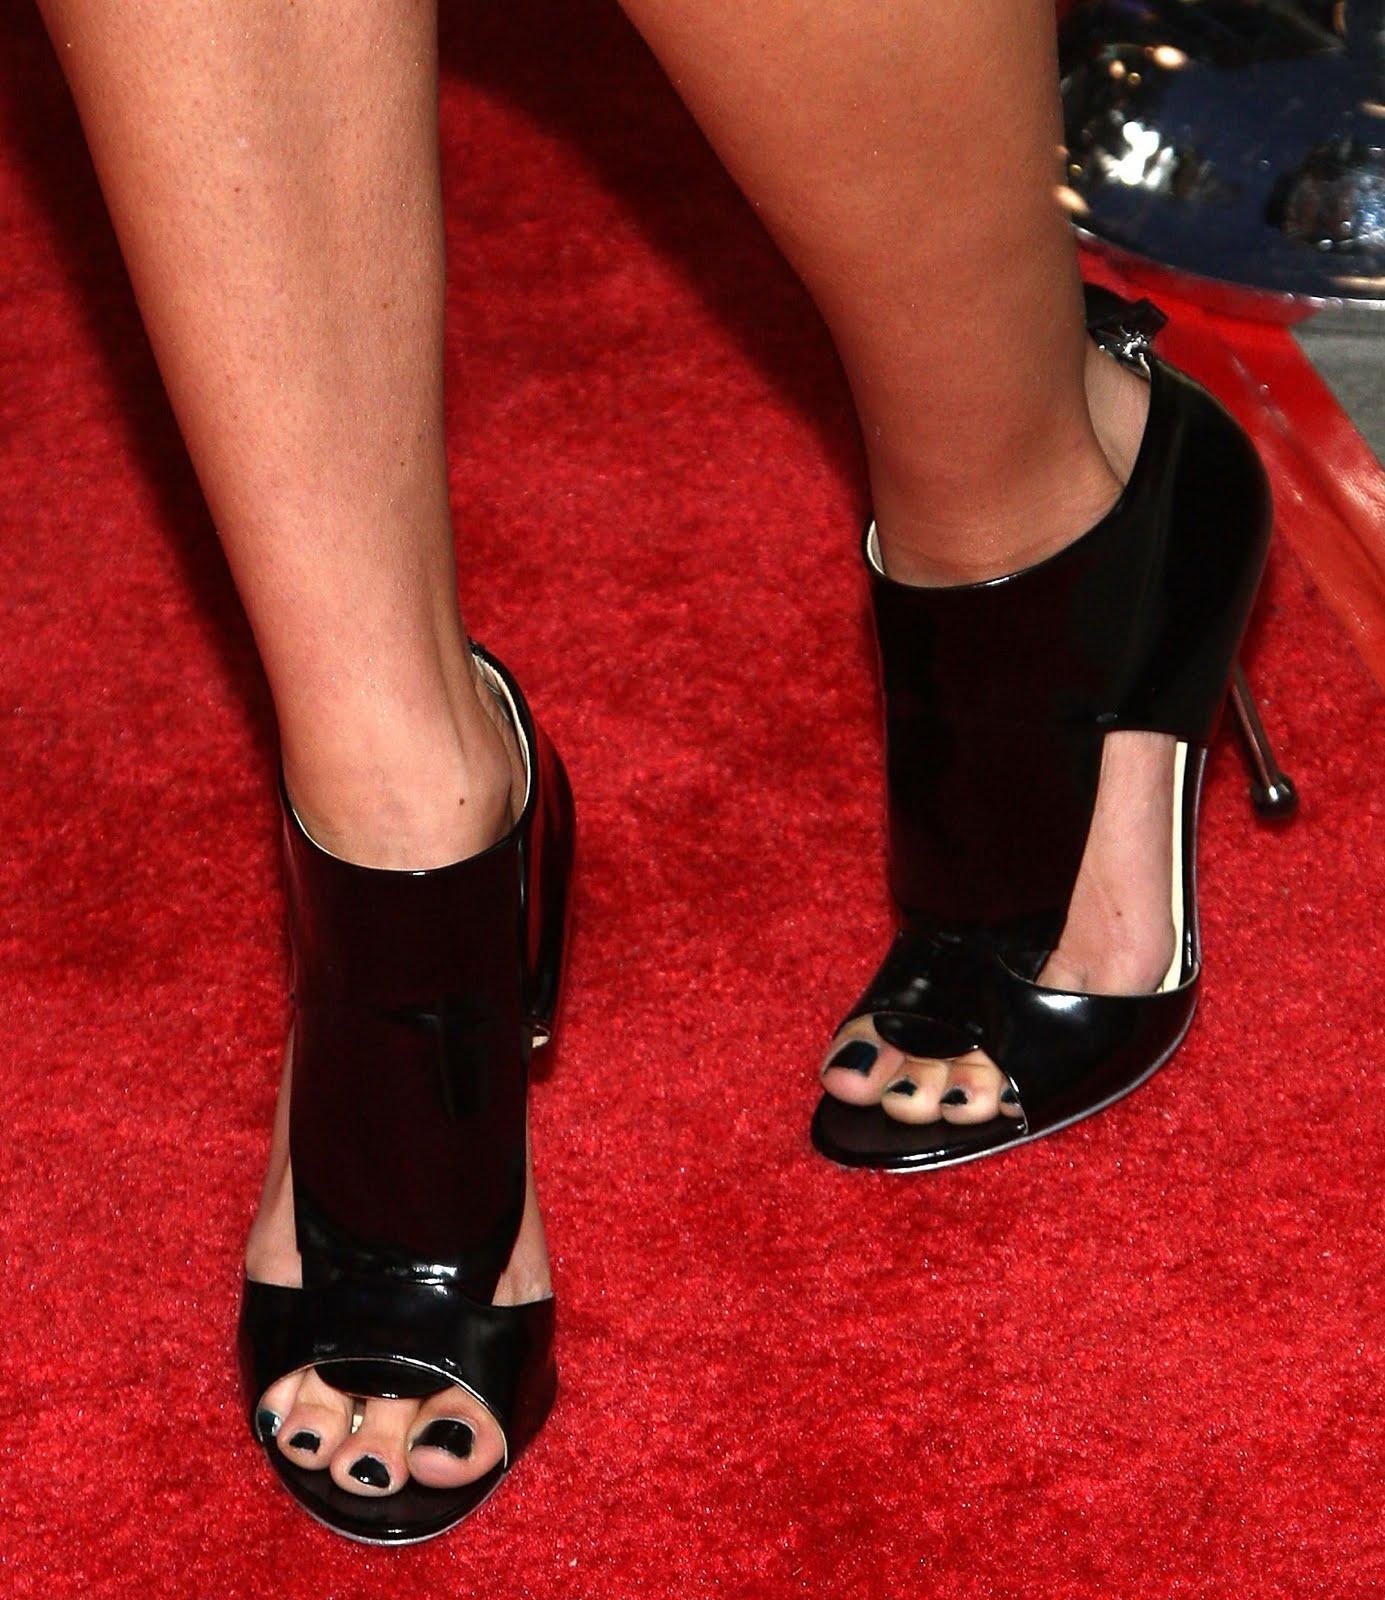 http://2.bp.blogspot.com/_UaLWp72nij4/S98pcqNOBGI/AAAAAAAAJaI/kkouye4NeQ0/s1600/jessica-stroup-feet-2.jpg